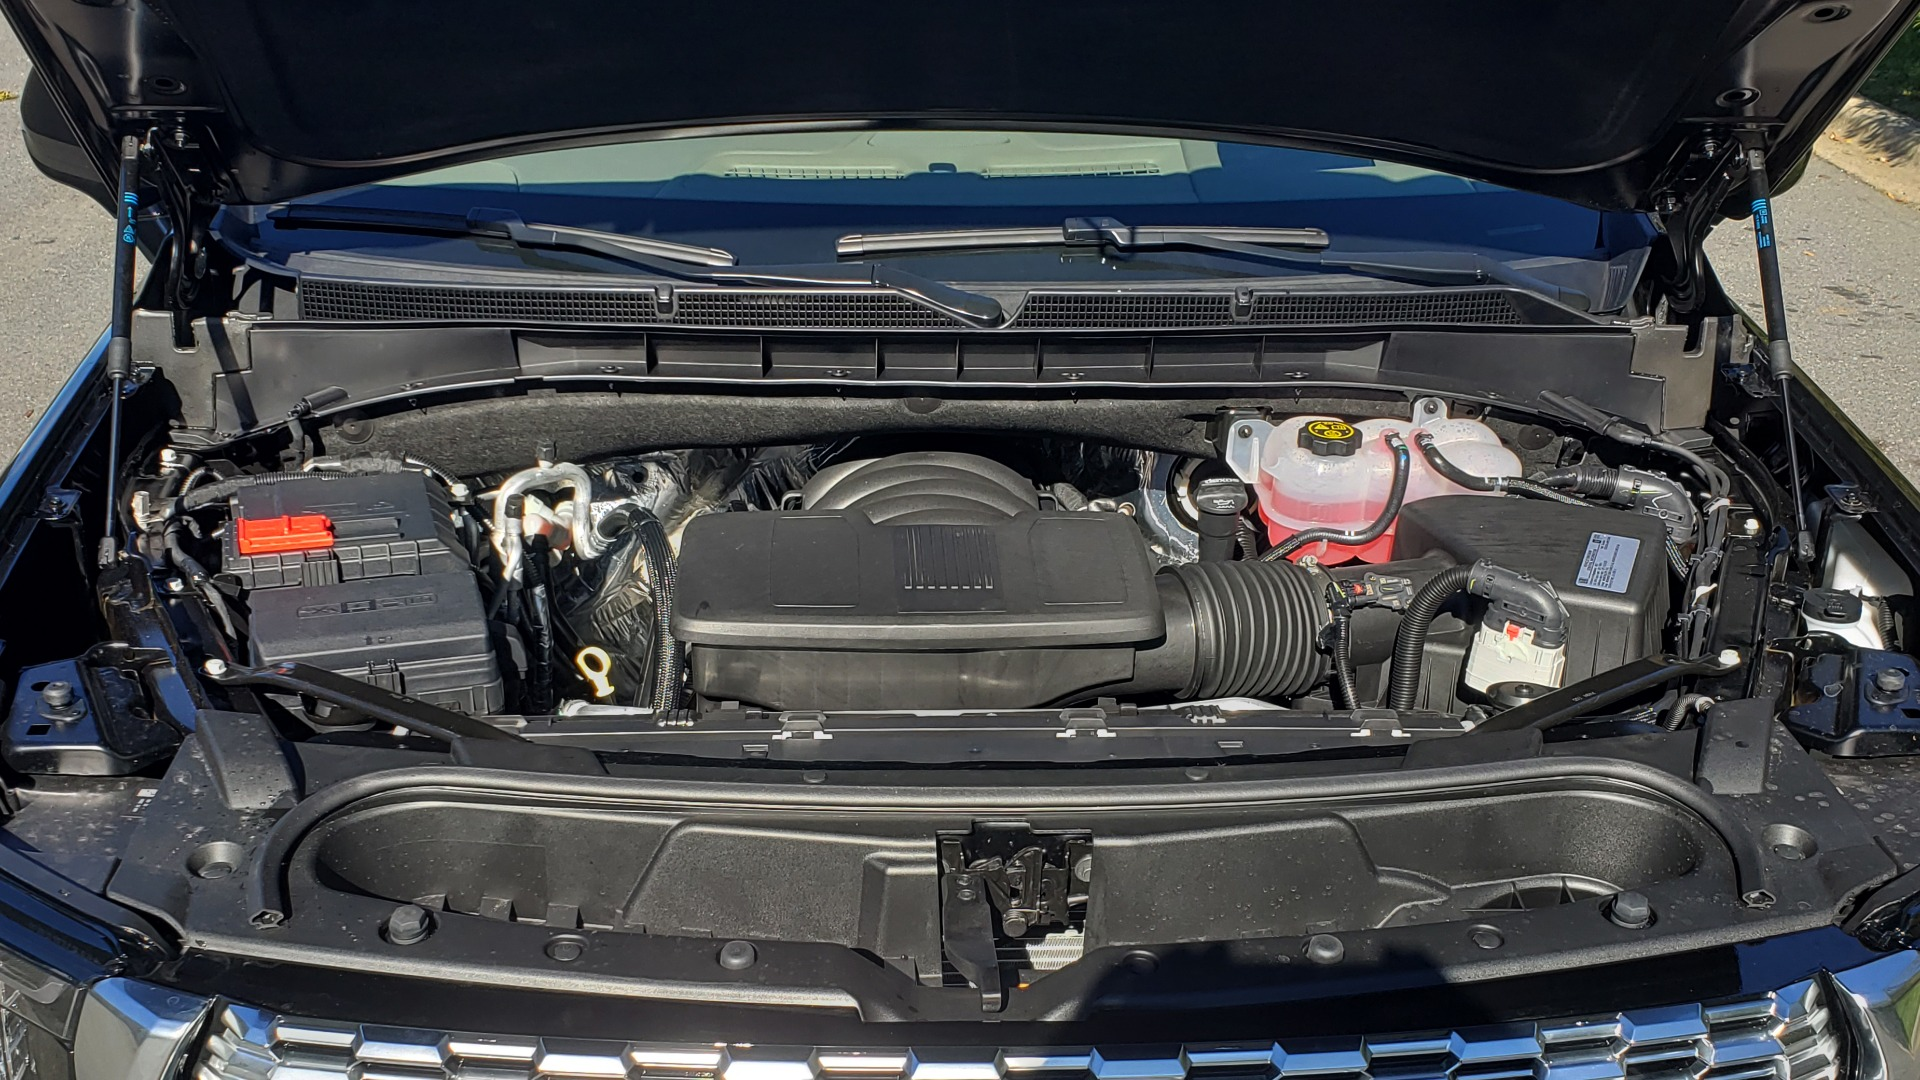 Used 2021 GMC YUKON DENALI PREMIUM 4WD / NAV / ADVANCED TECH / ENTERTAINMENT for sale Sold at Formula Imports in Charlotte NC 28227 14